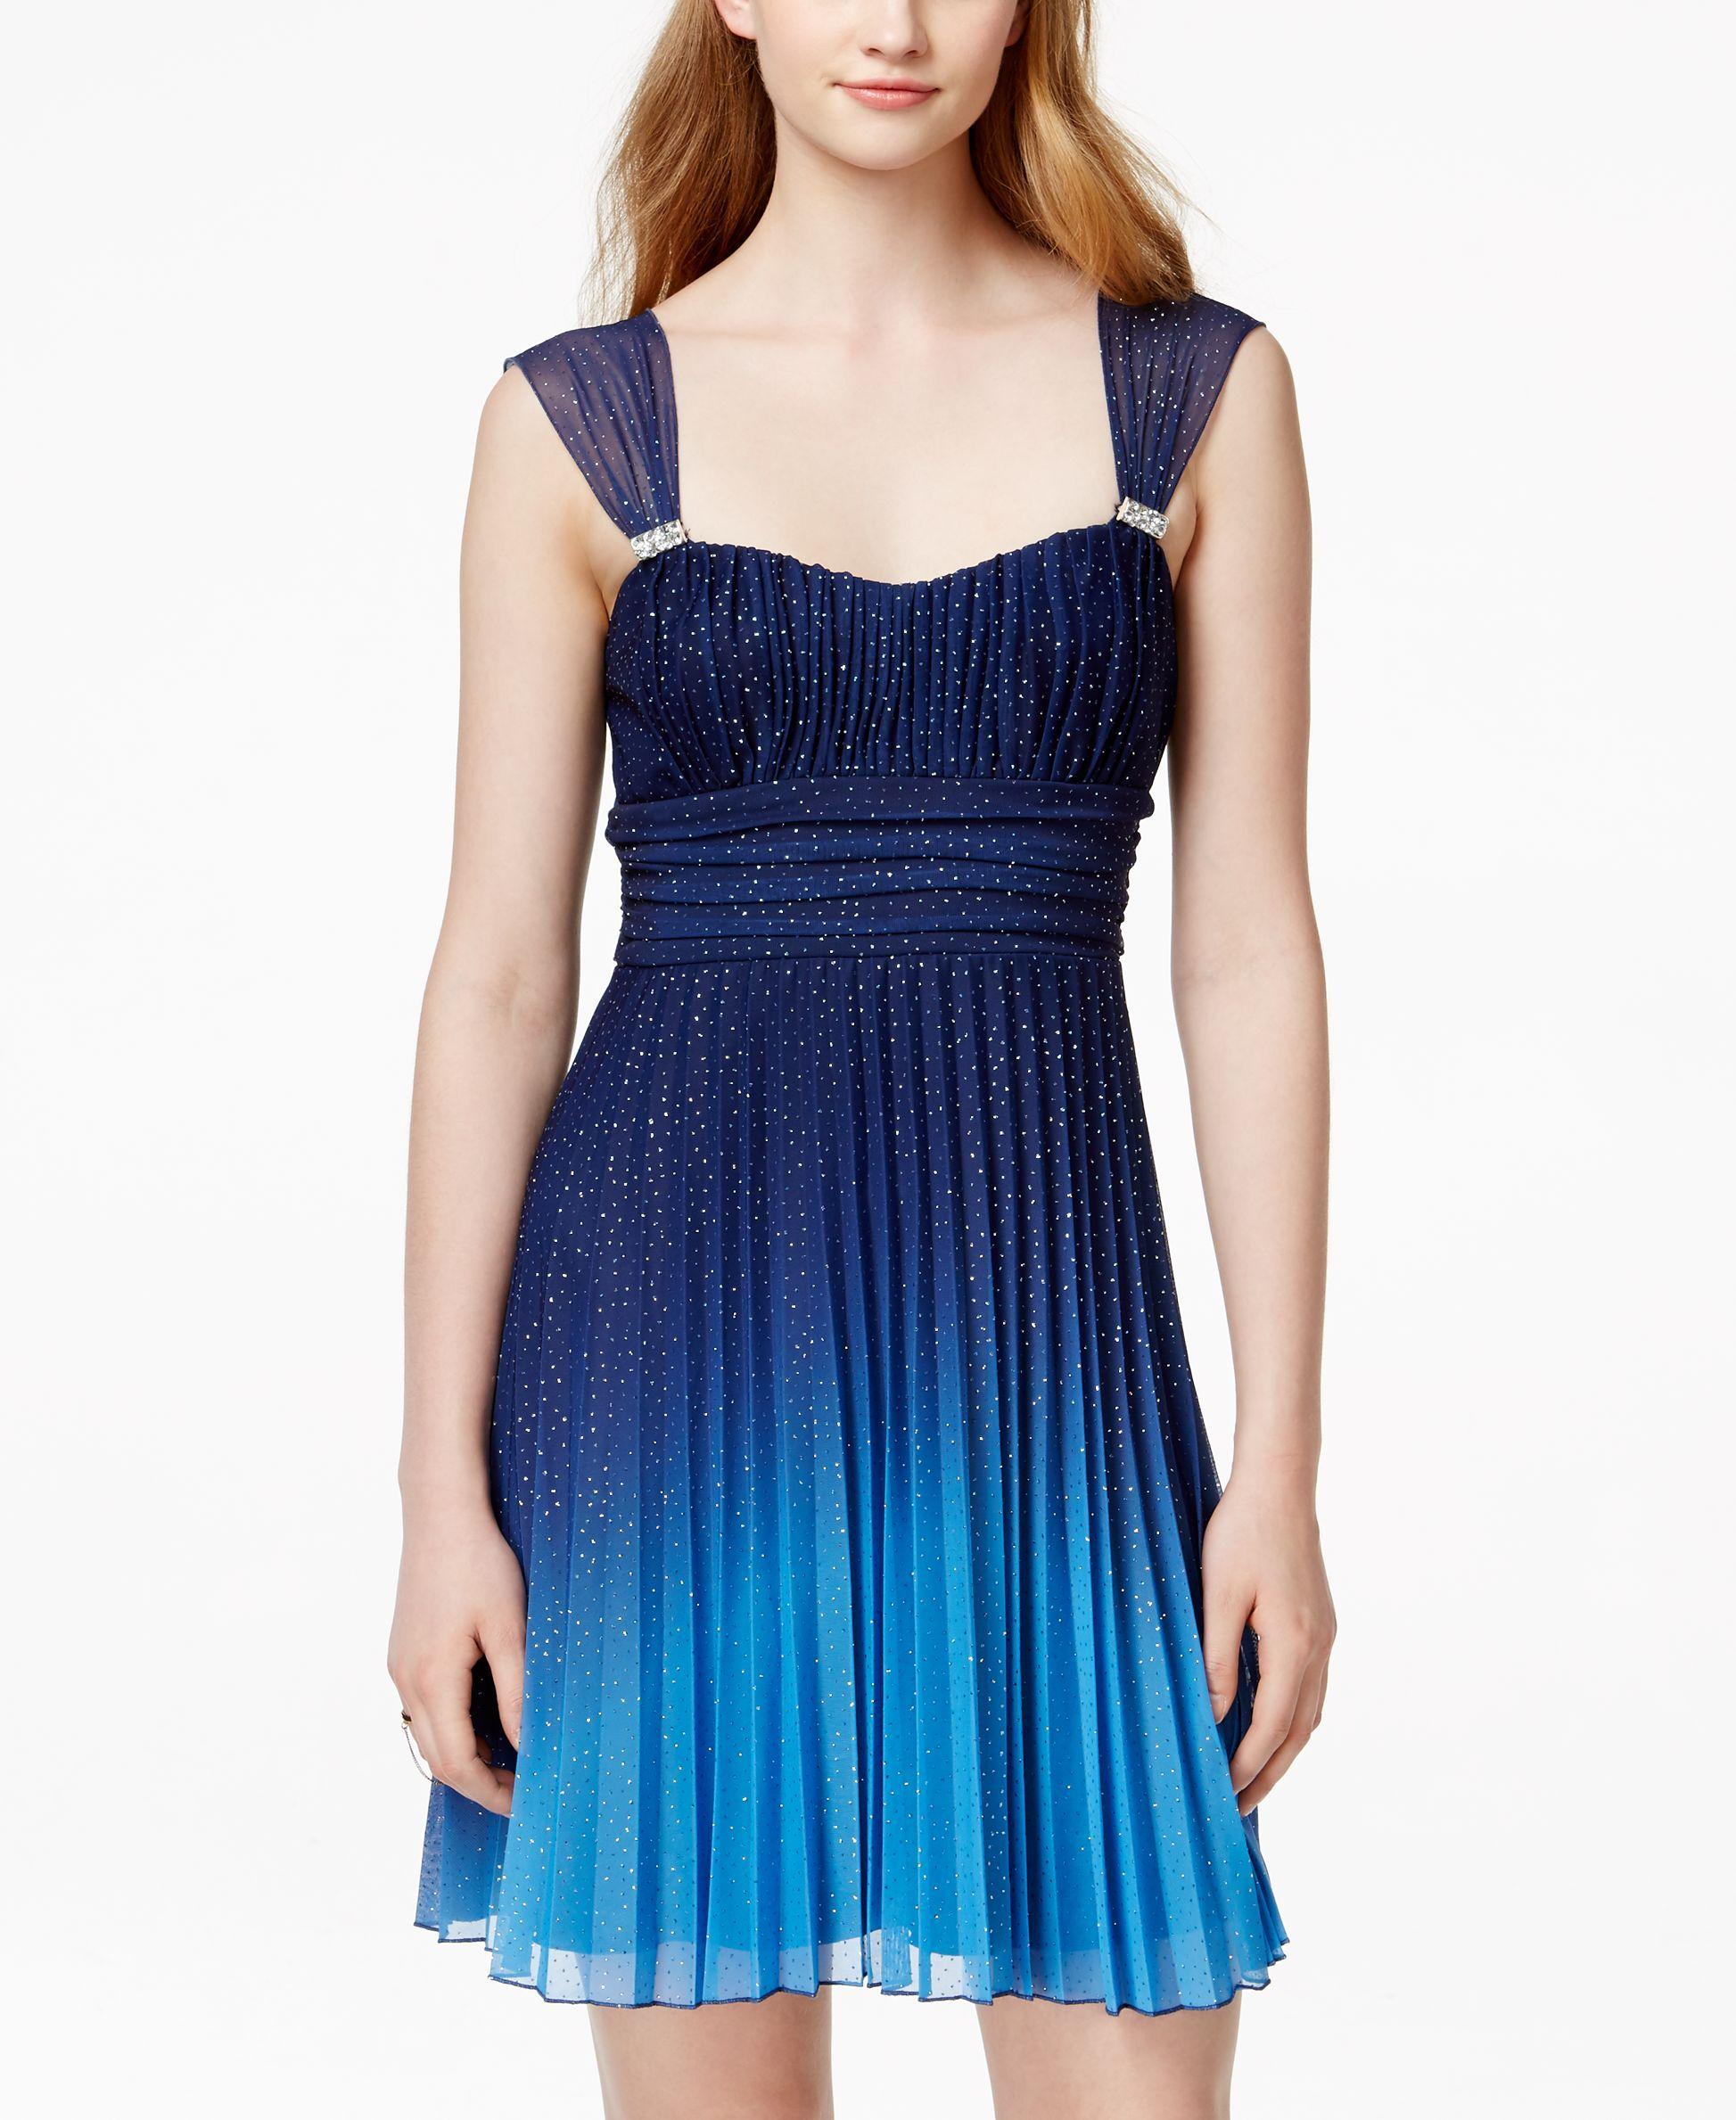 Speechless Juniors\' Glittered Ombre Dress | Ballkkeider | Pinterest